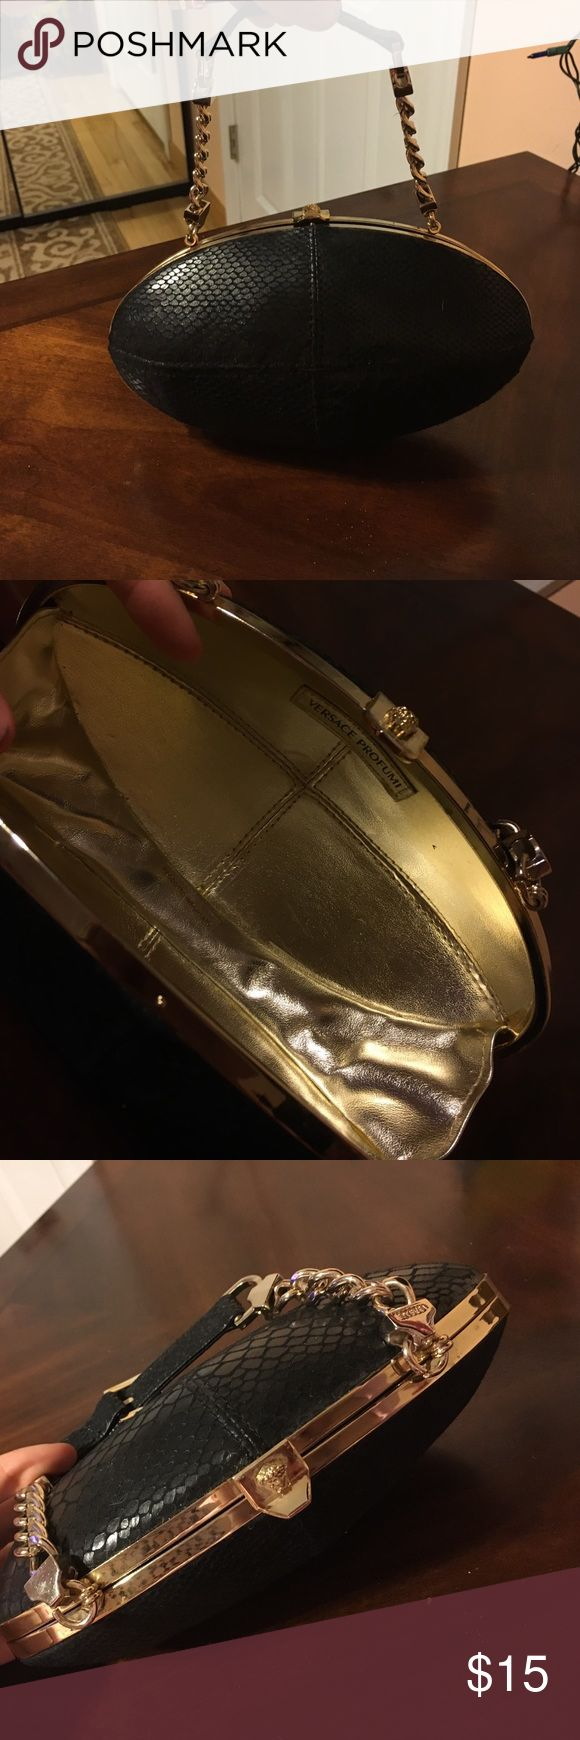 Versace Profumo Purse Versace Profumi small purse, never used before Bags Mini Bags